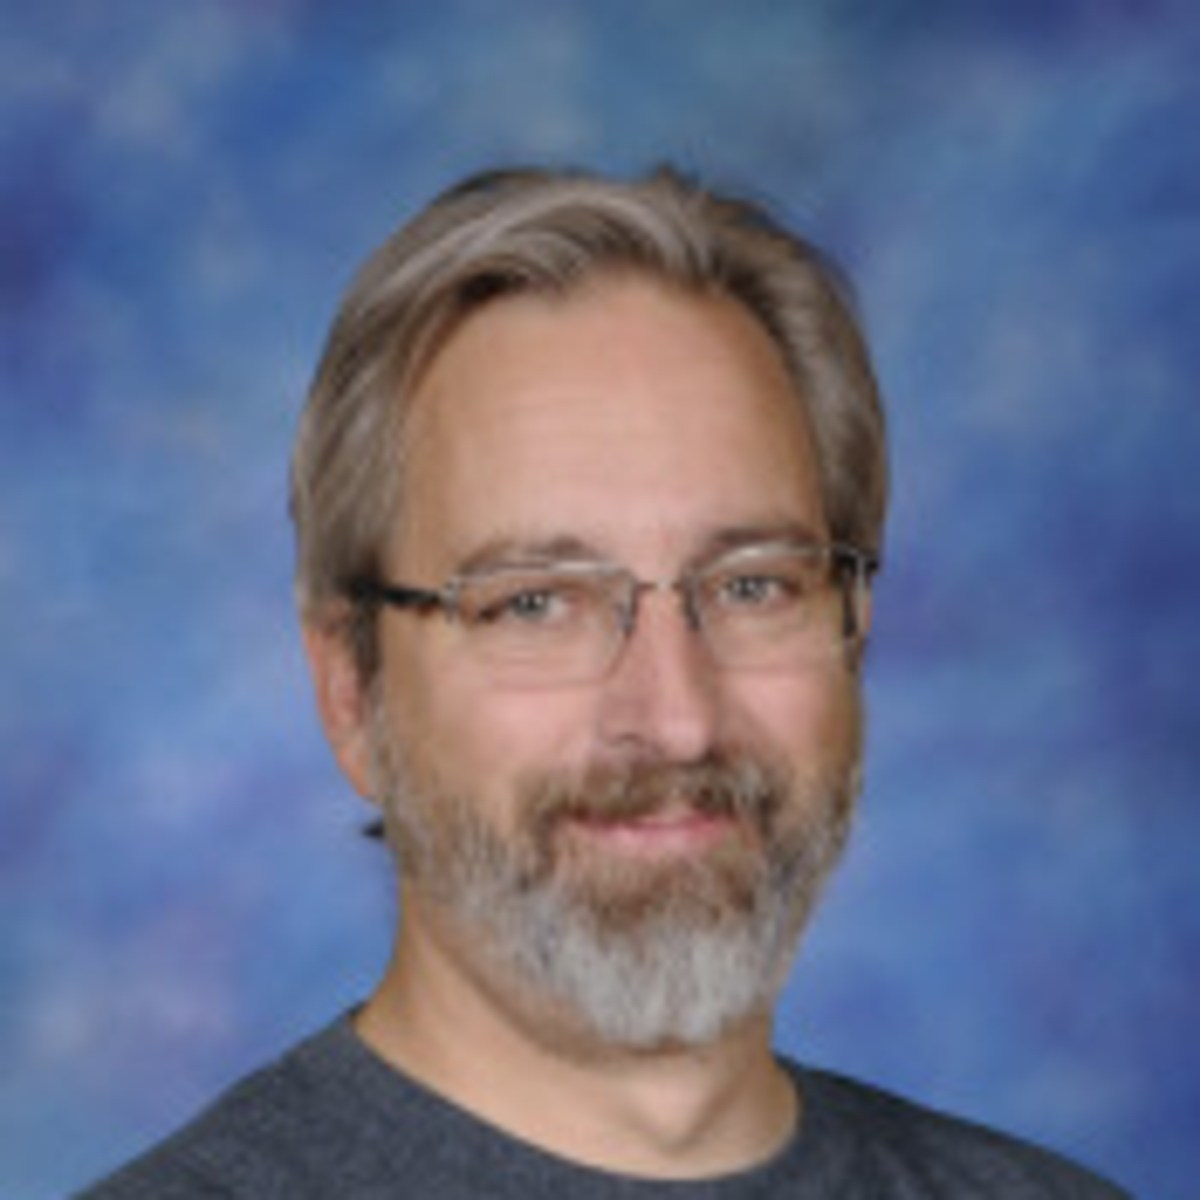 About Me – Mr Joe Smith – STEM School Highlands Ranch